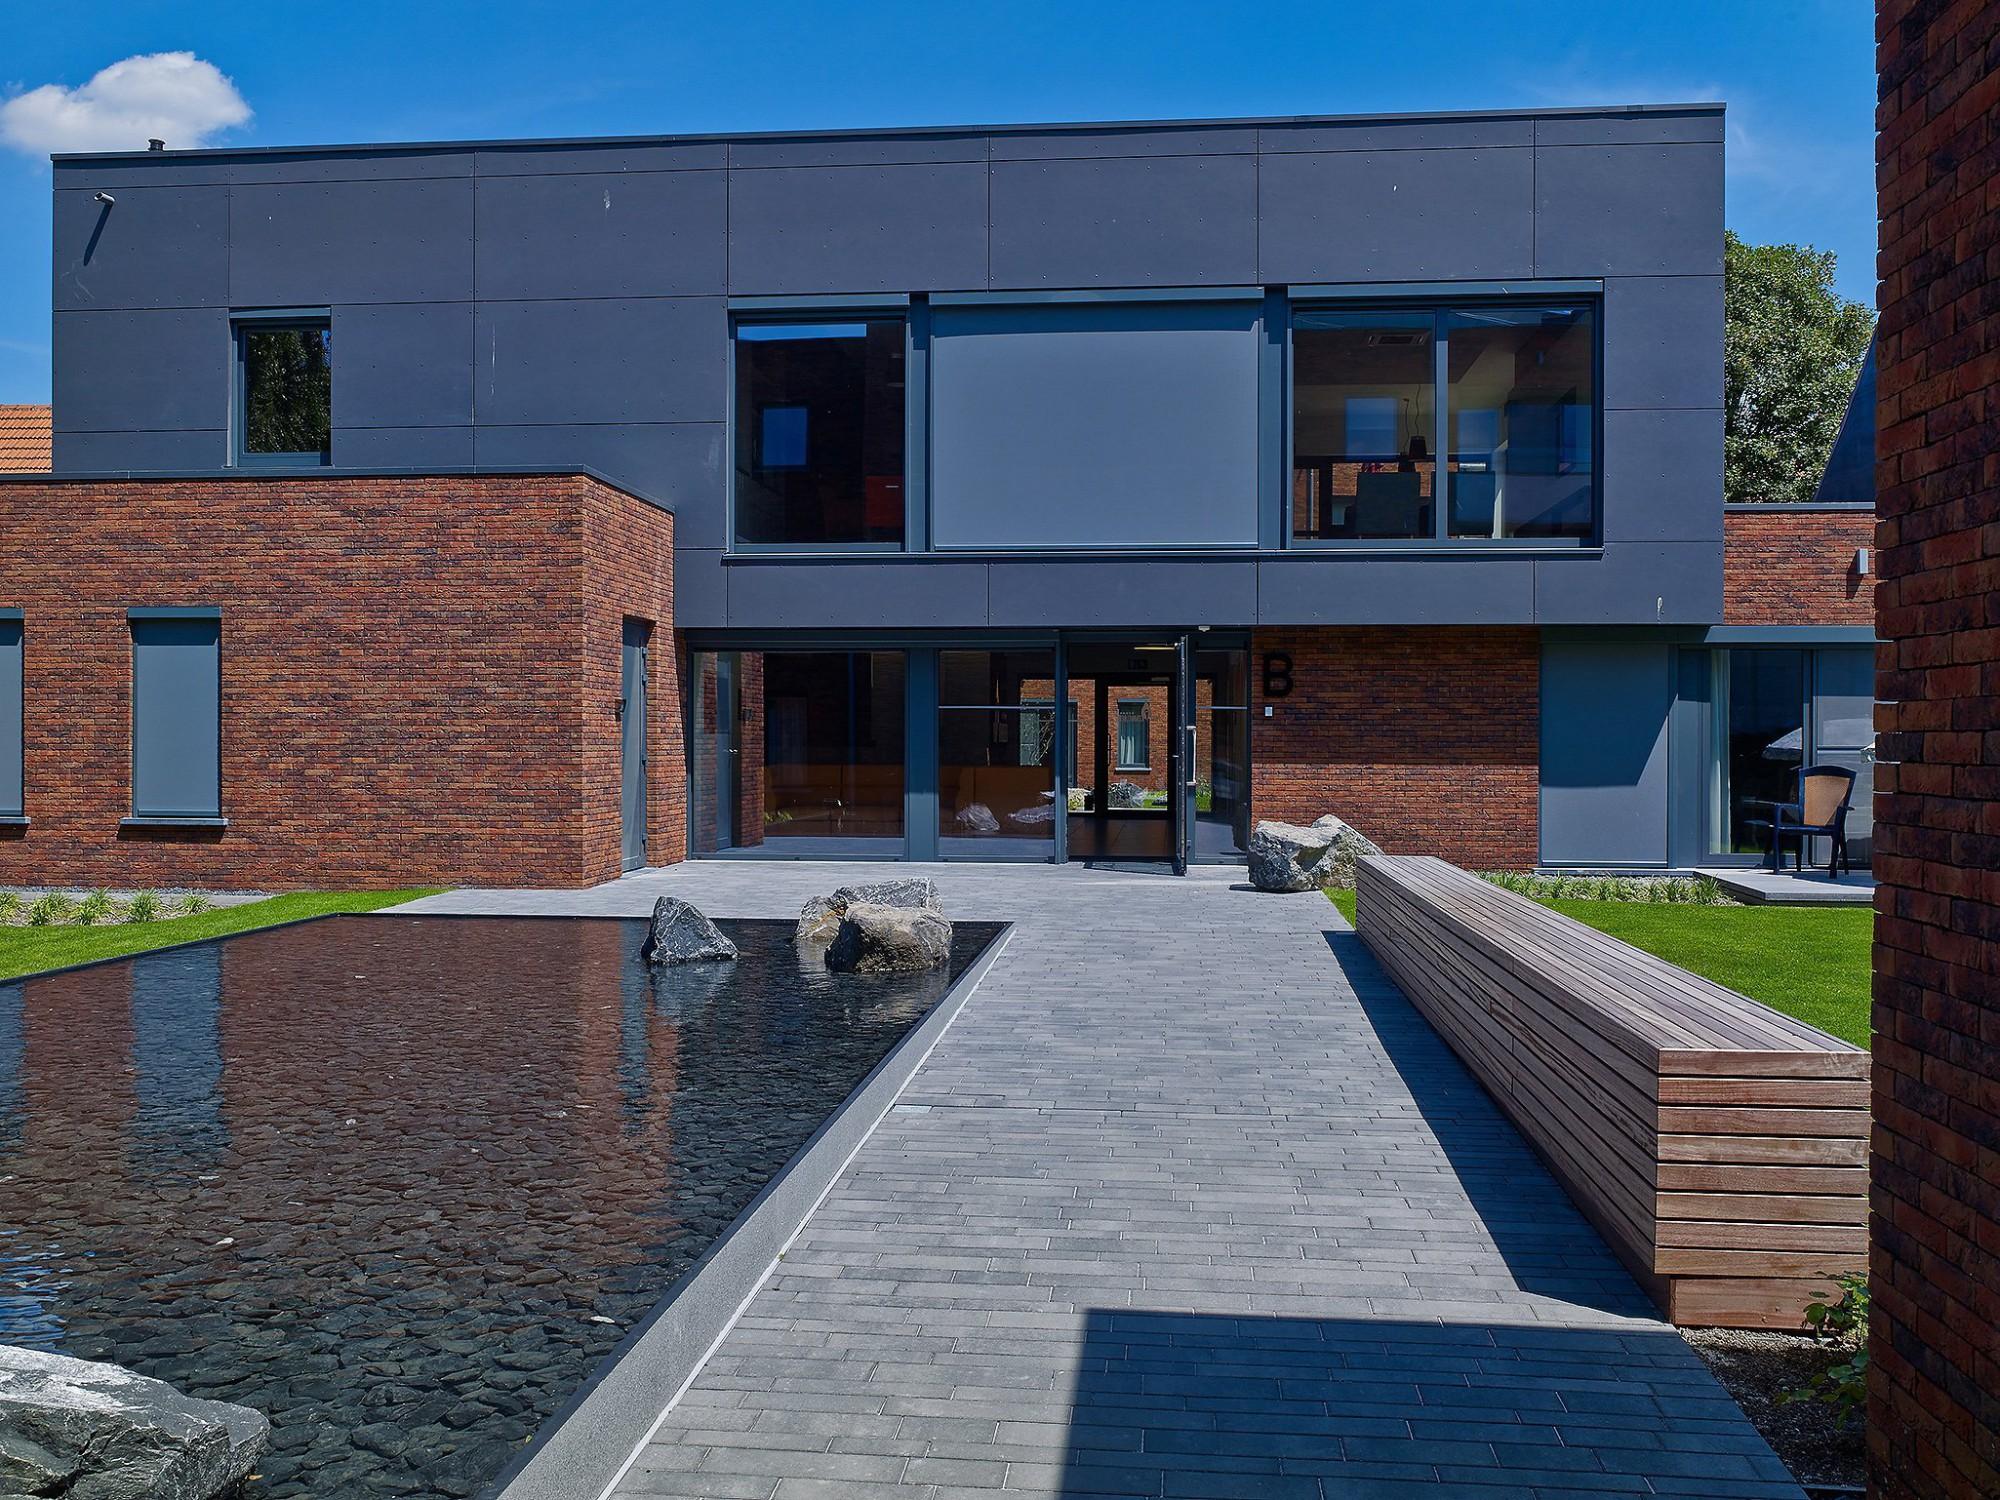 Afbeelding: Fotografie architectuur woonzorgcentrum privé te Berchem voor Stone&Style.